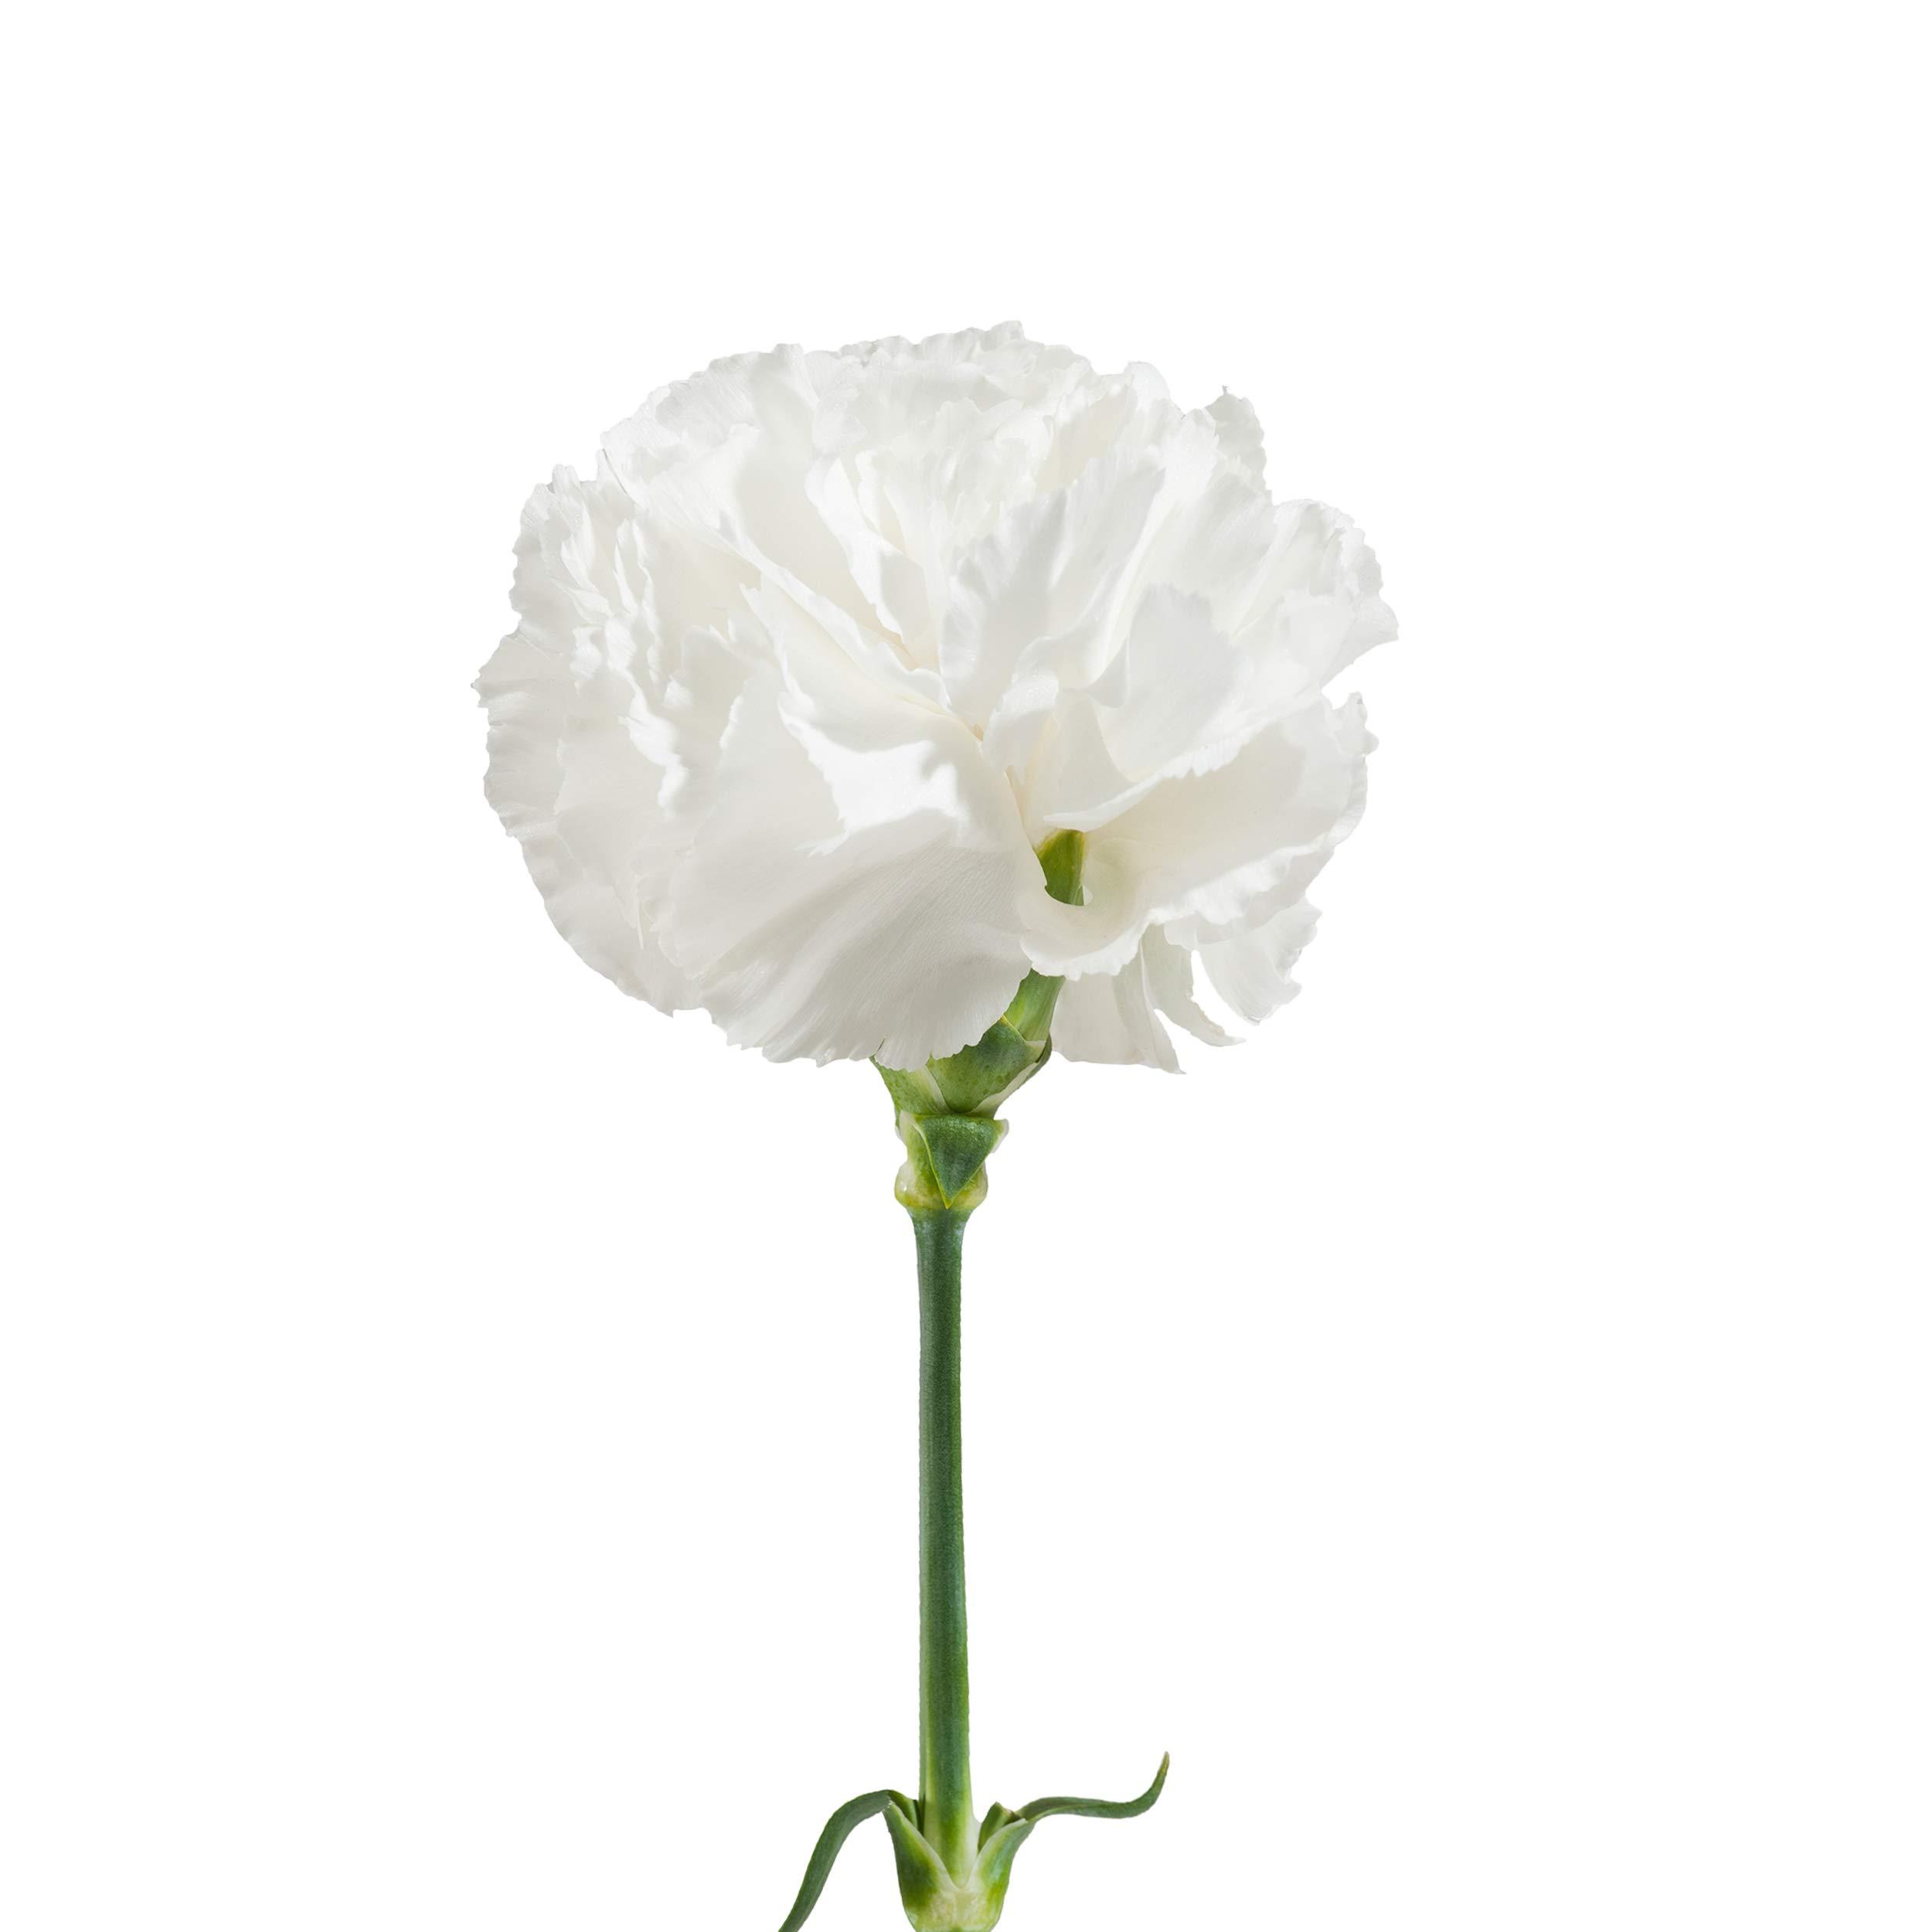 Farm Fresh Natural White Carnation - 100 Stems